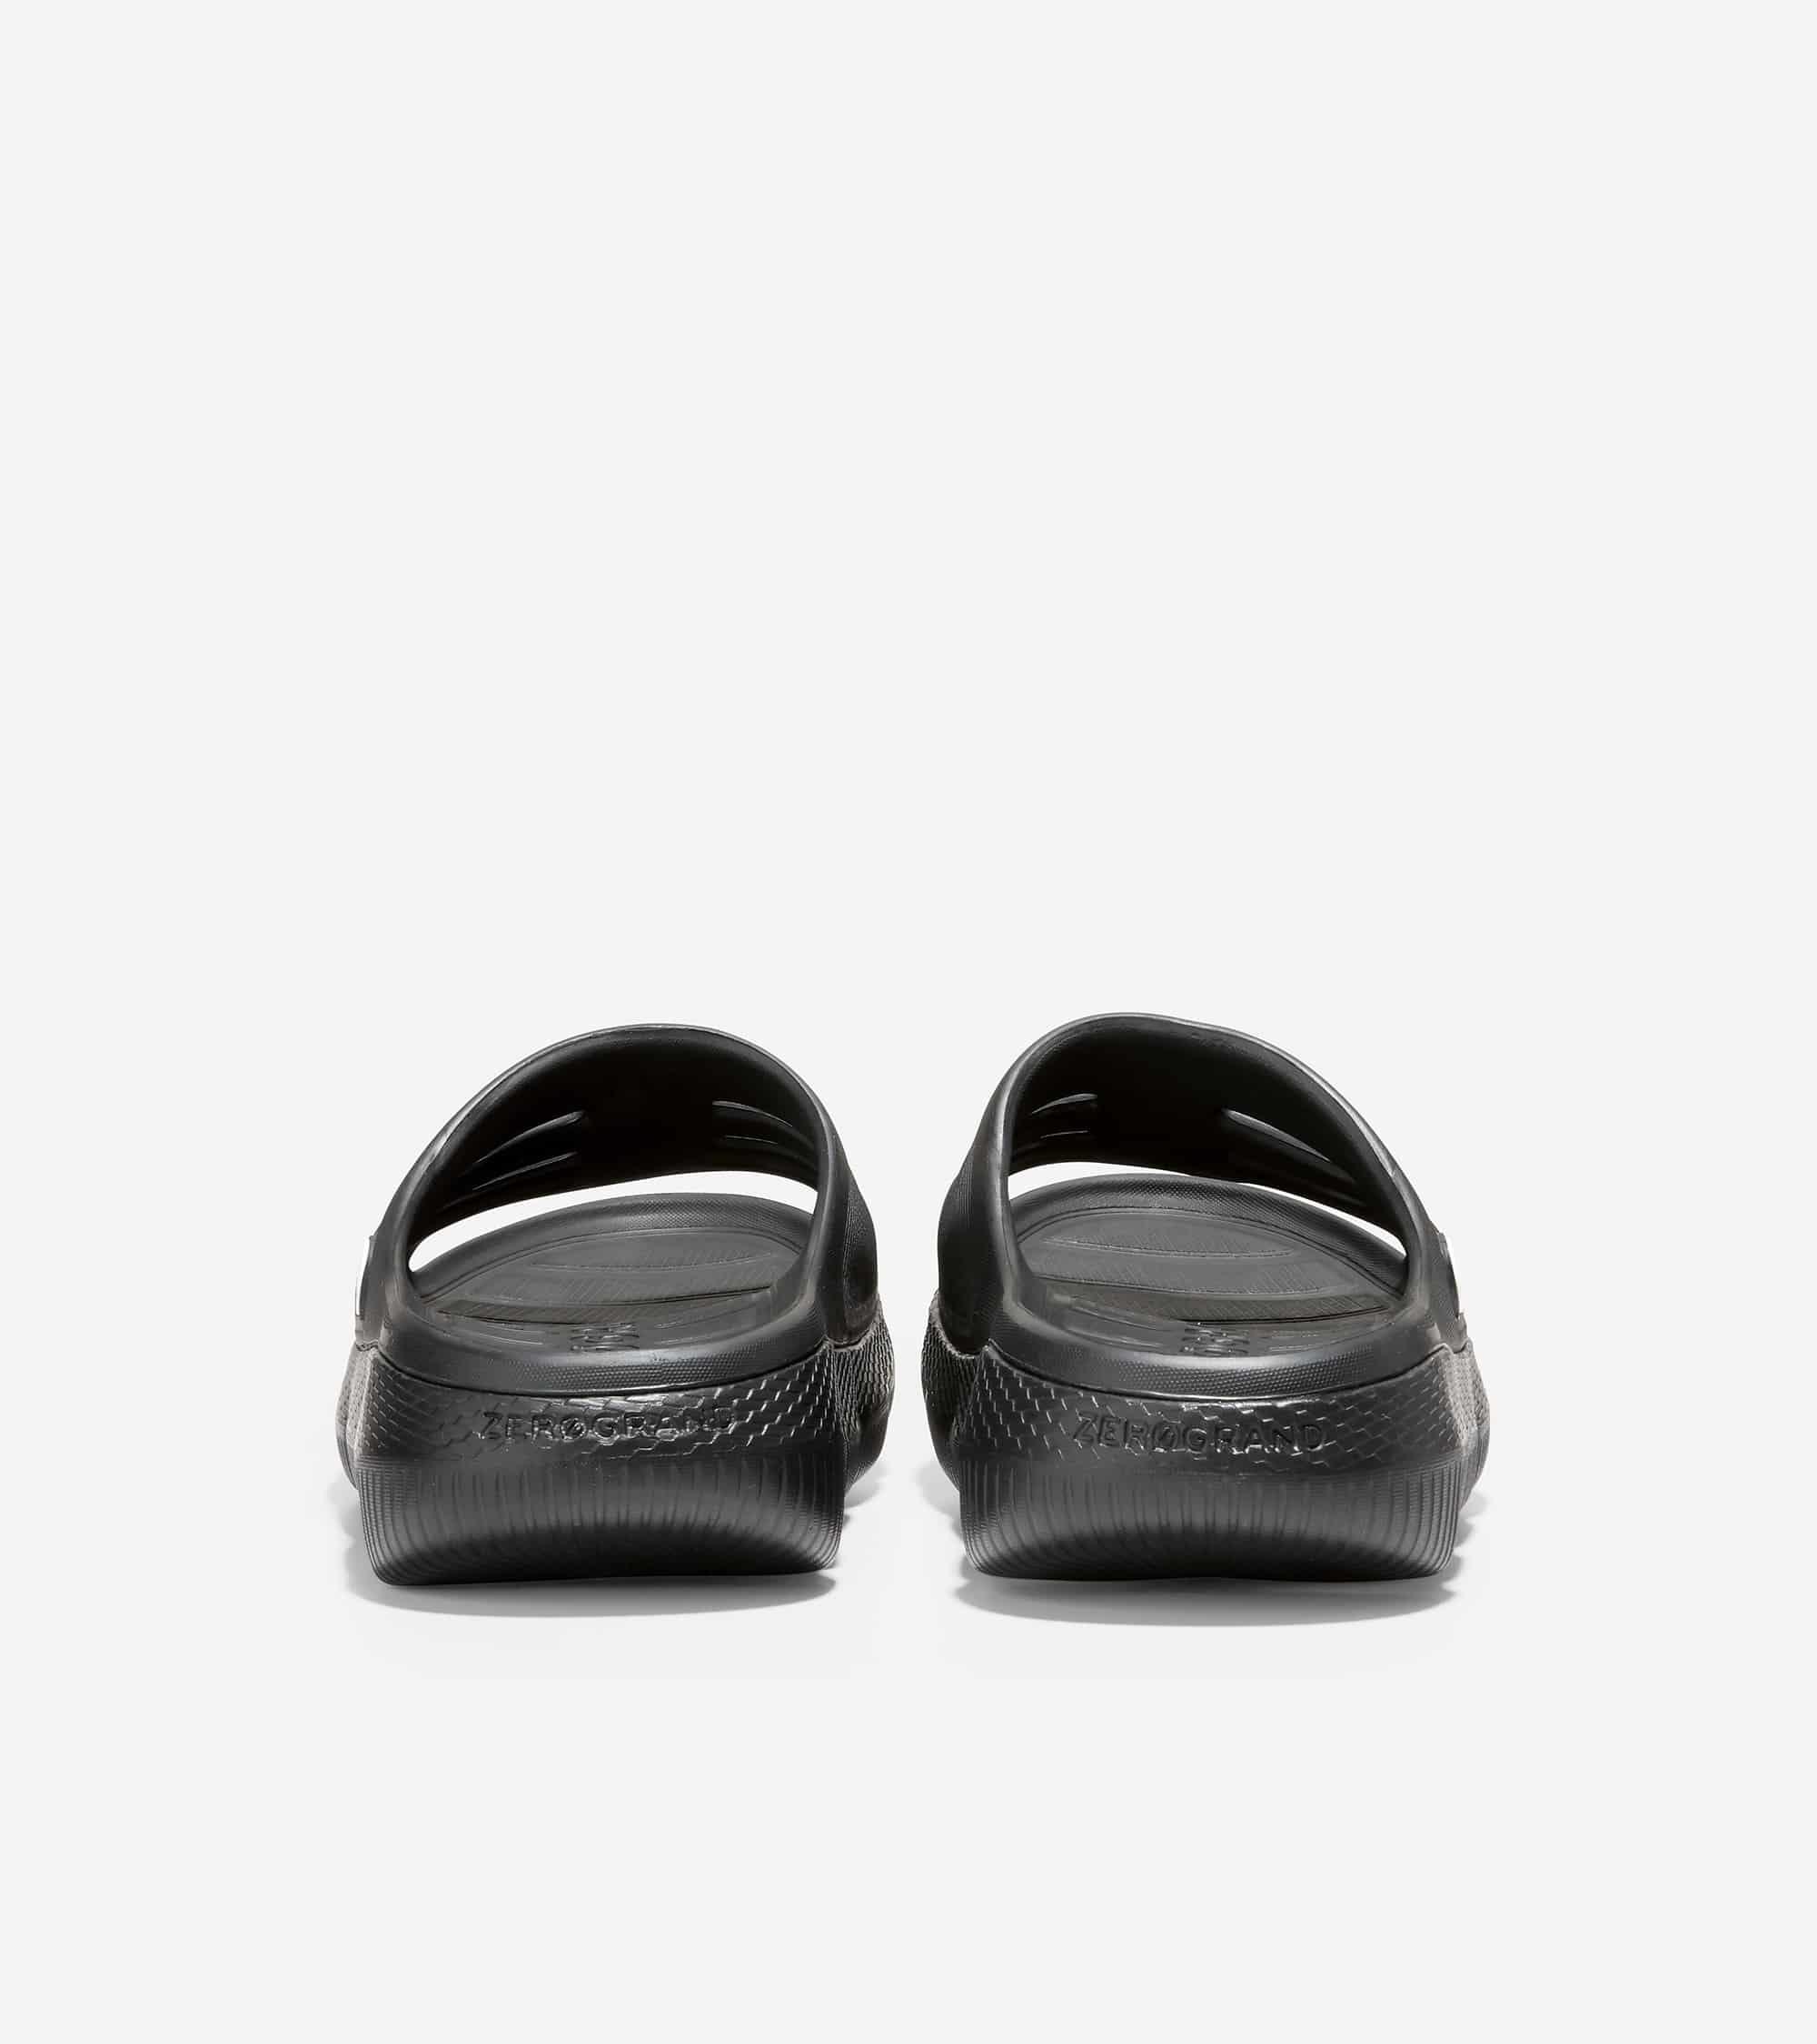 Cole Haan 4.ZERØGRAND All Day Slide Black/Black